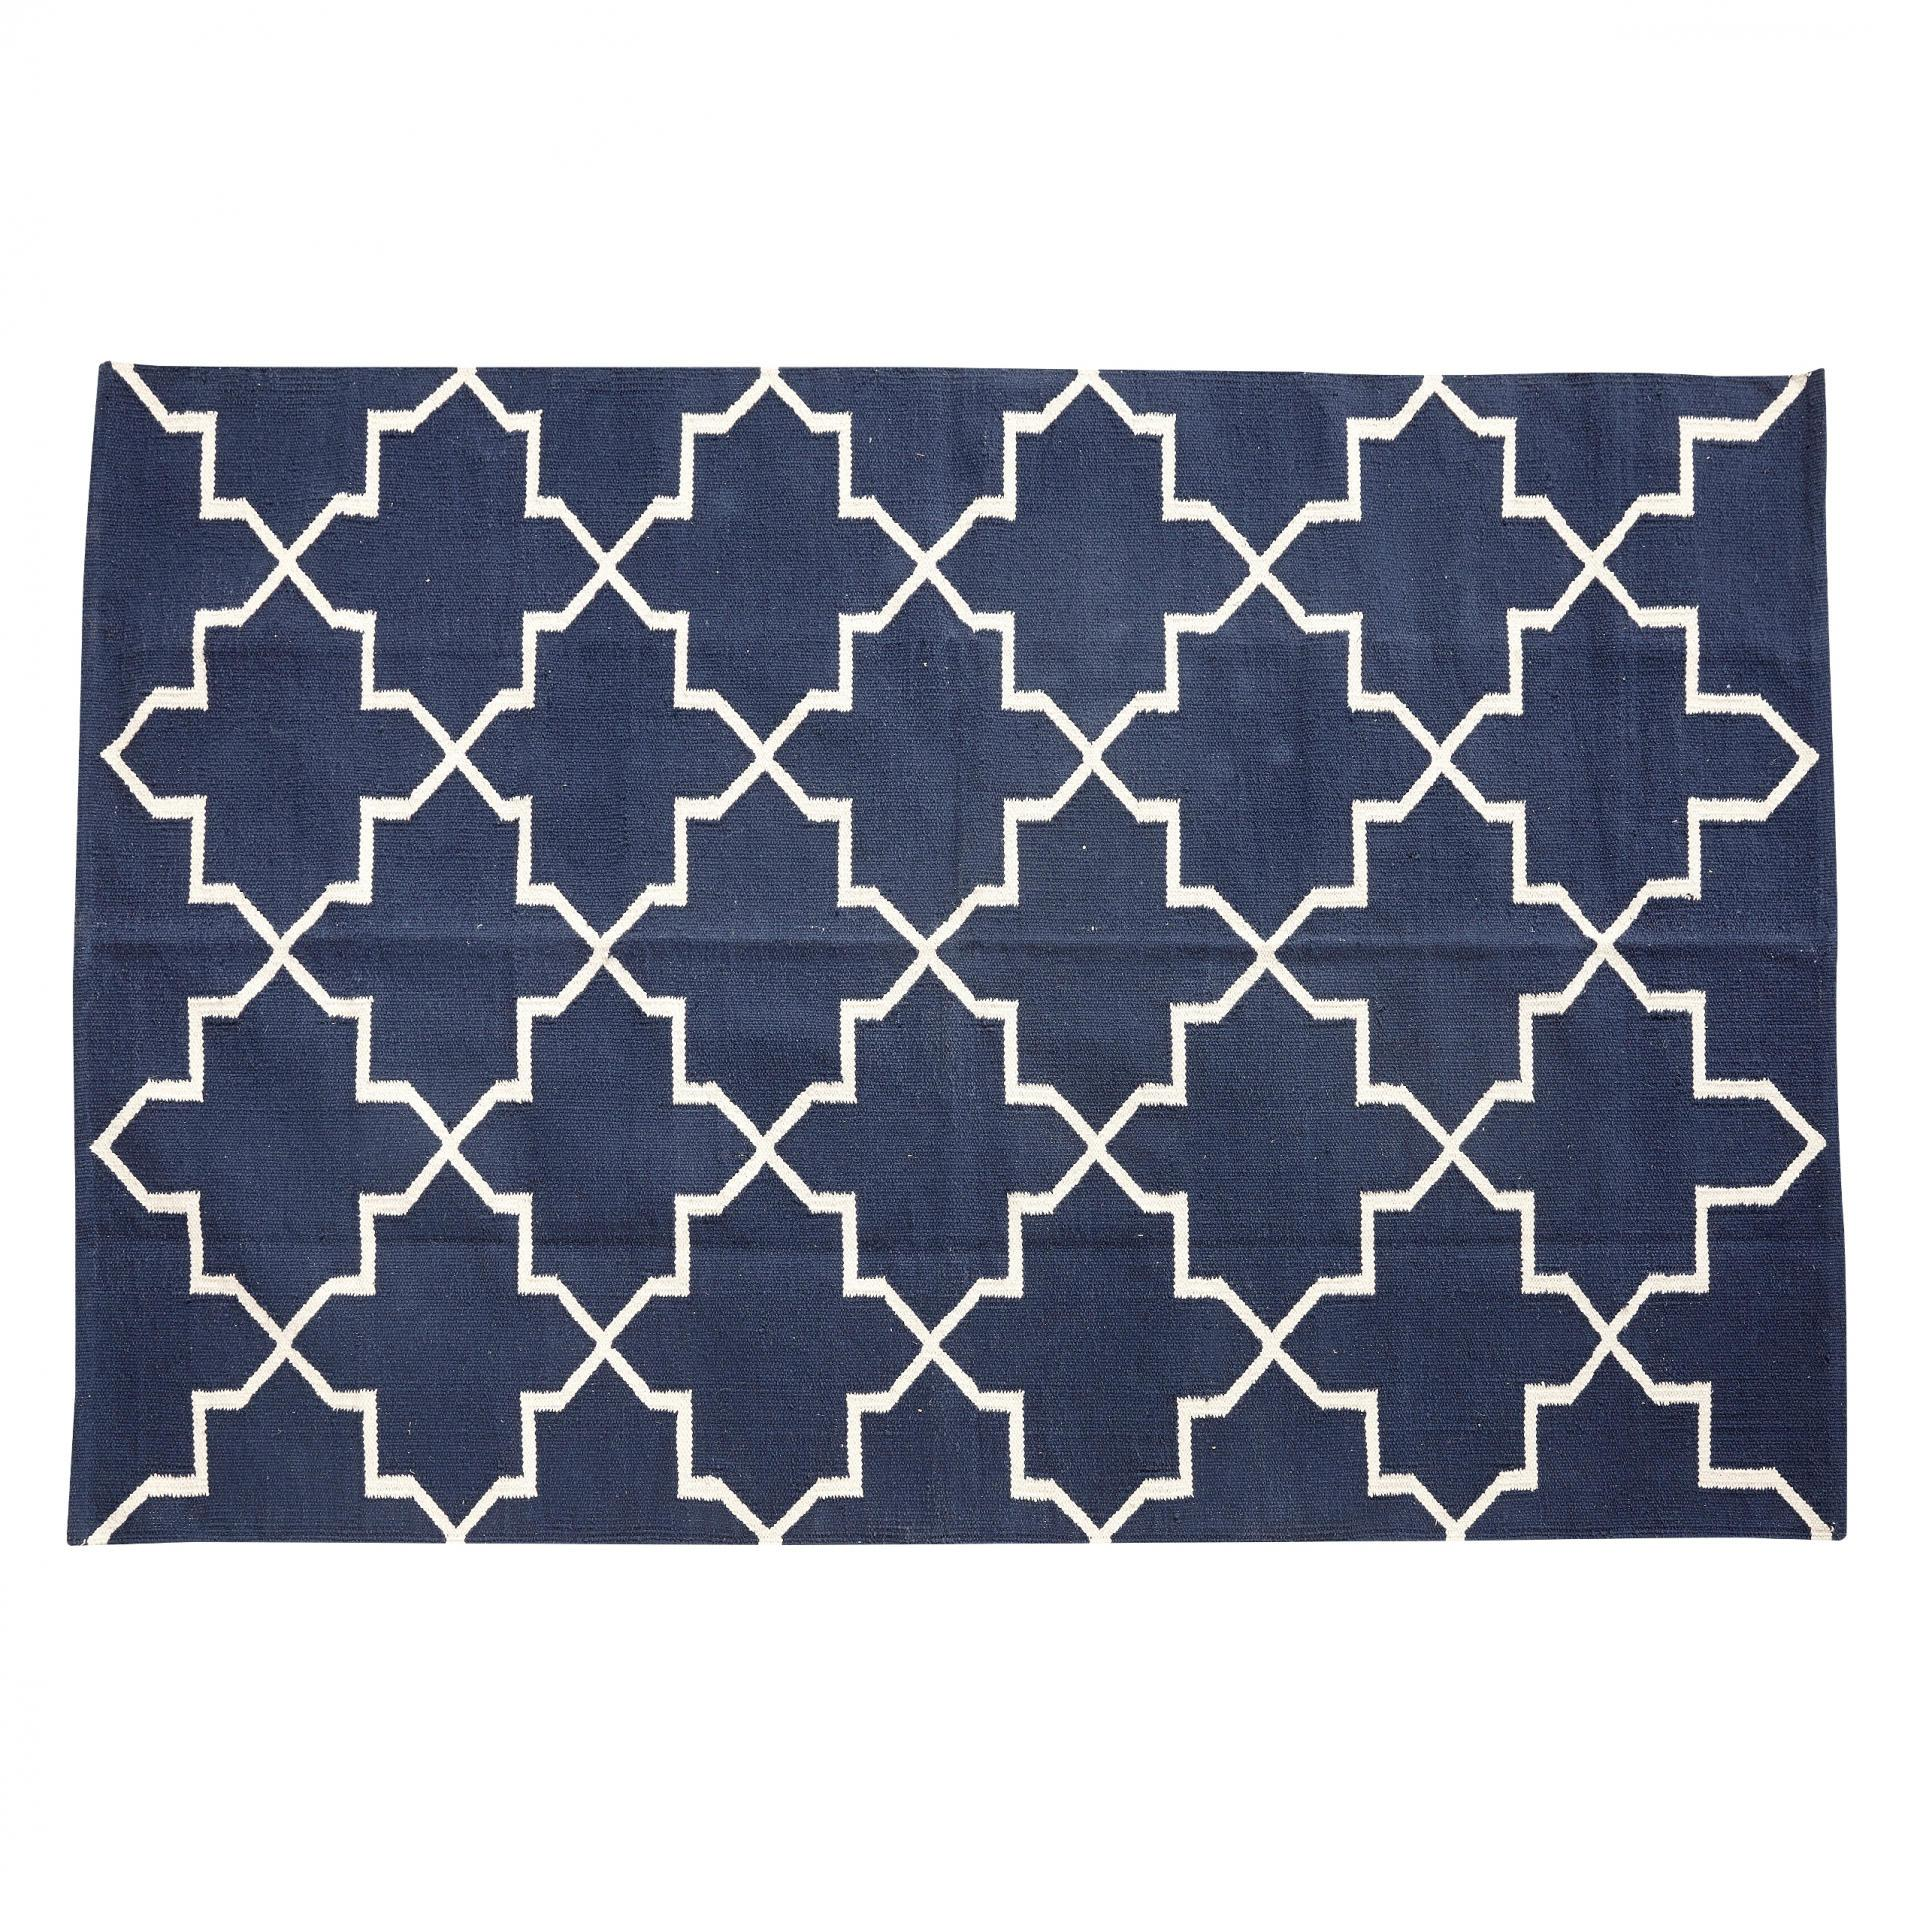 Hübsch Tkaný koberec Border Line 120x180, modrá barva, textil Modrá